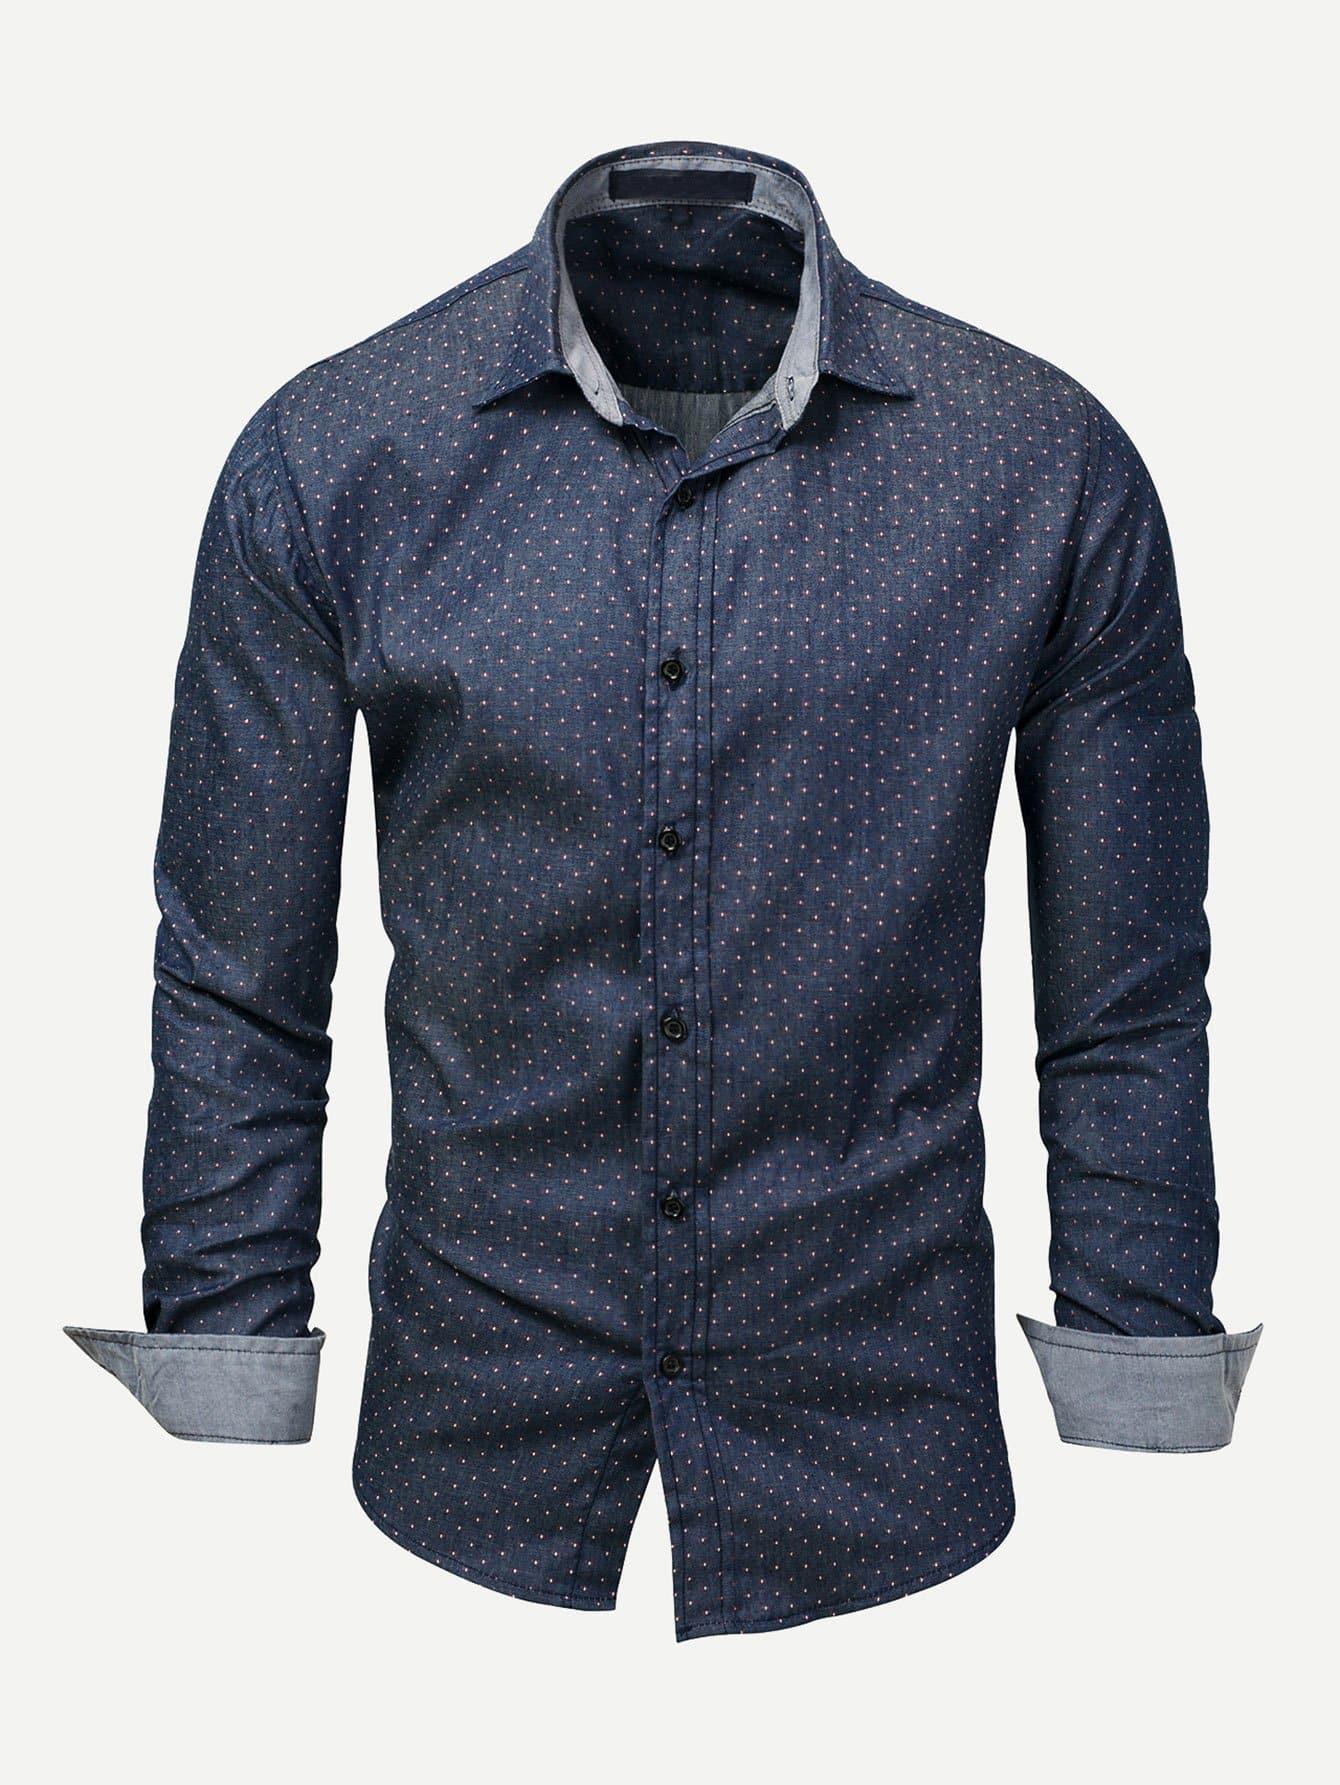 Men Polka Dot Collar Denim Shirt Men Polka Dot Collar Denim Shirt